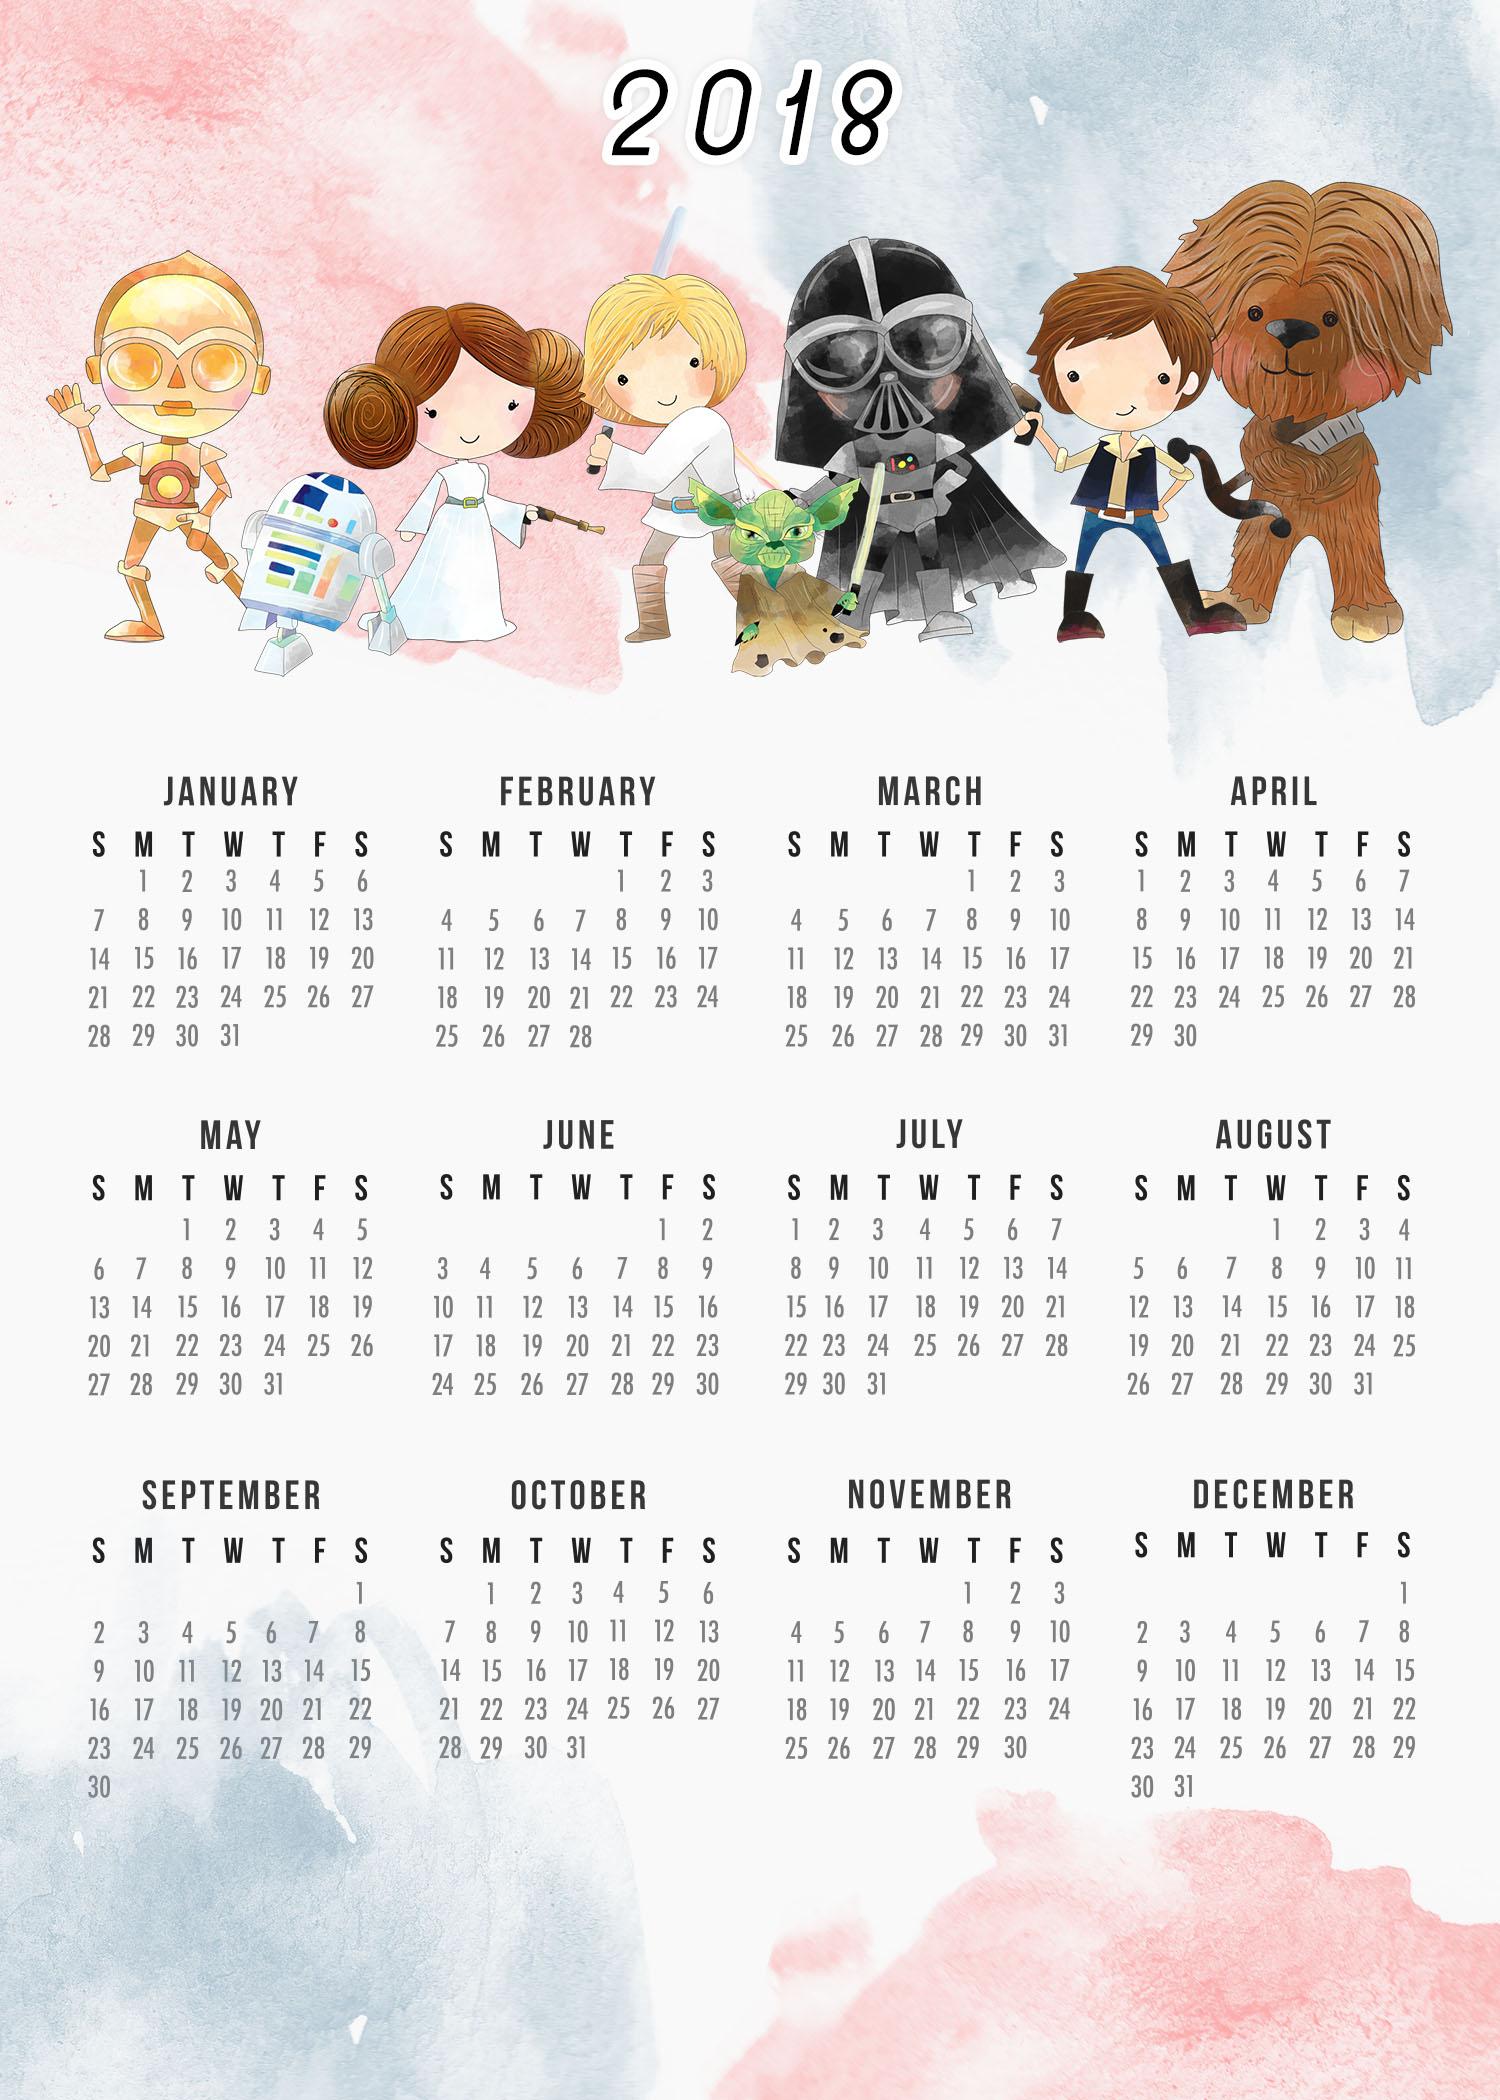 Free Printable Star Wars Calendar One Page Original Trilogy